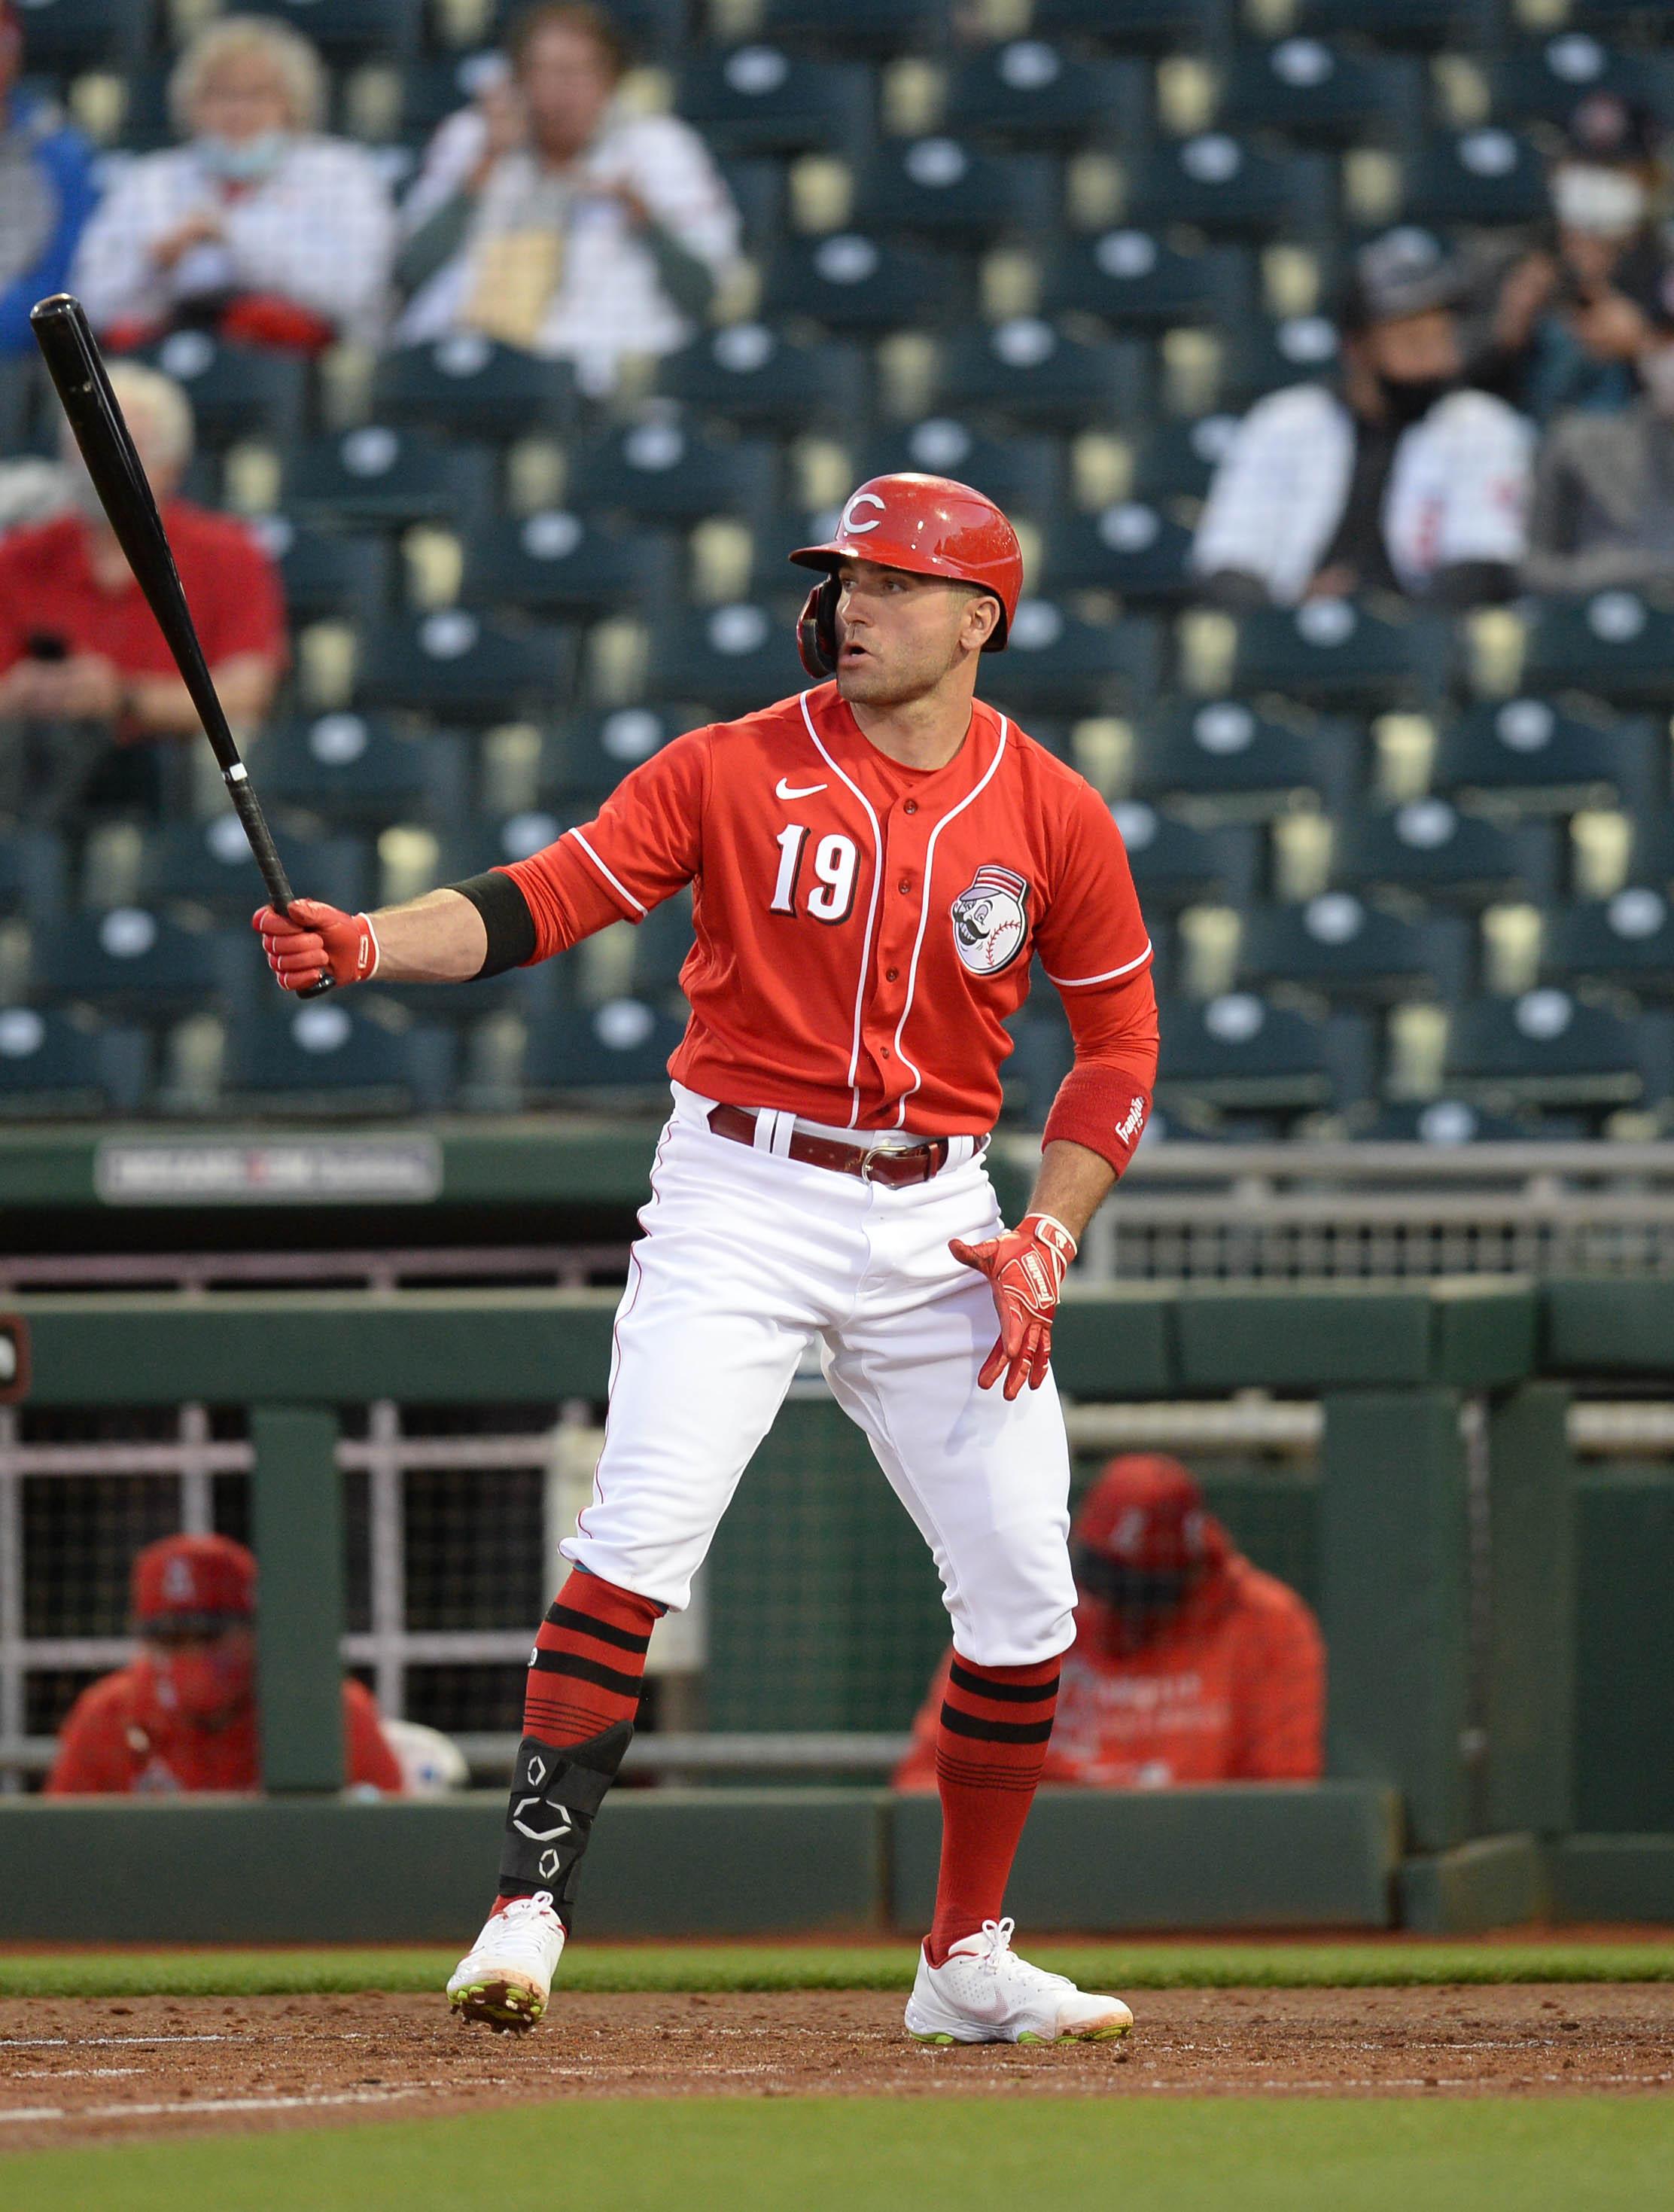 MLB: Los Angeles Angels at Cincinnati Reds